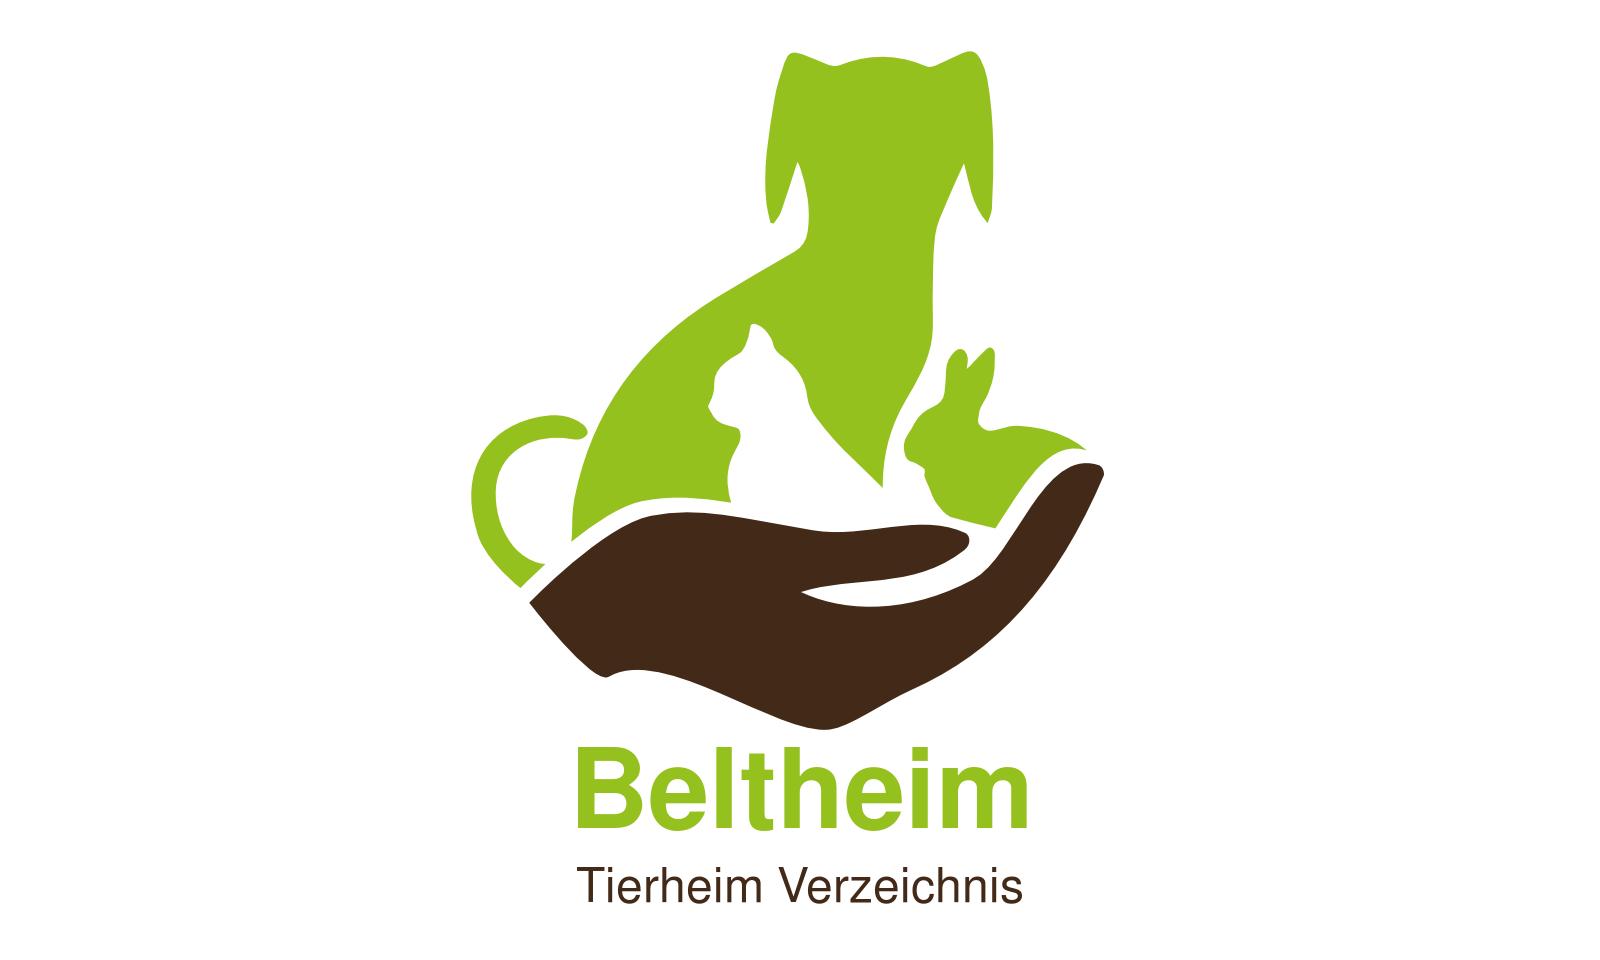 Tierheim Beltheim